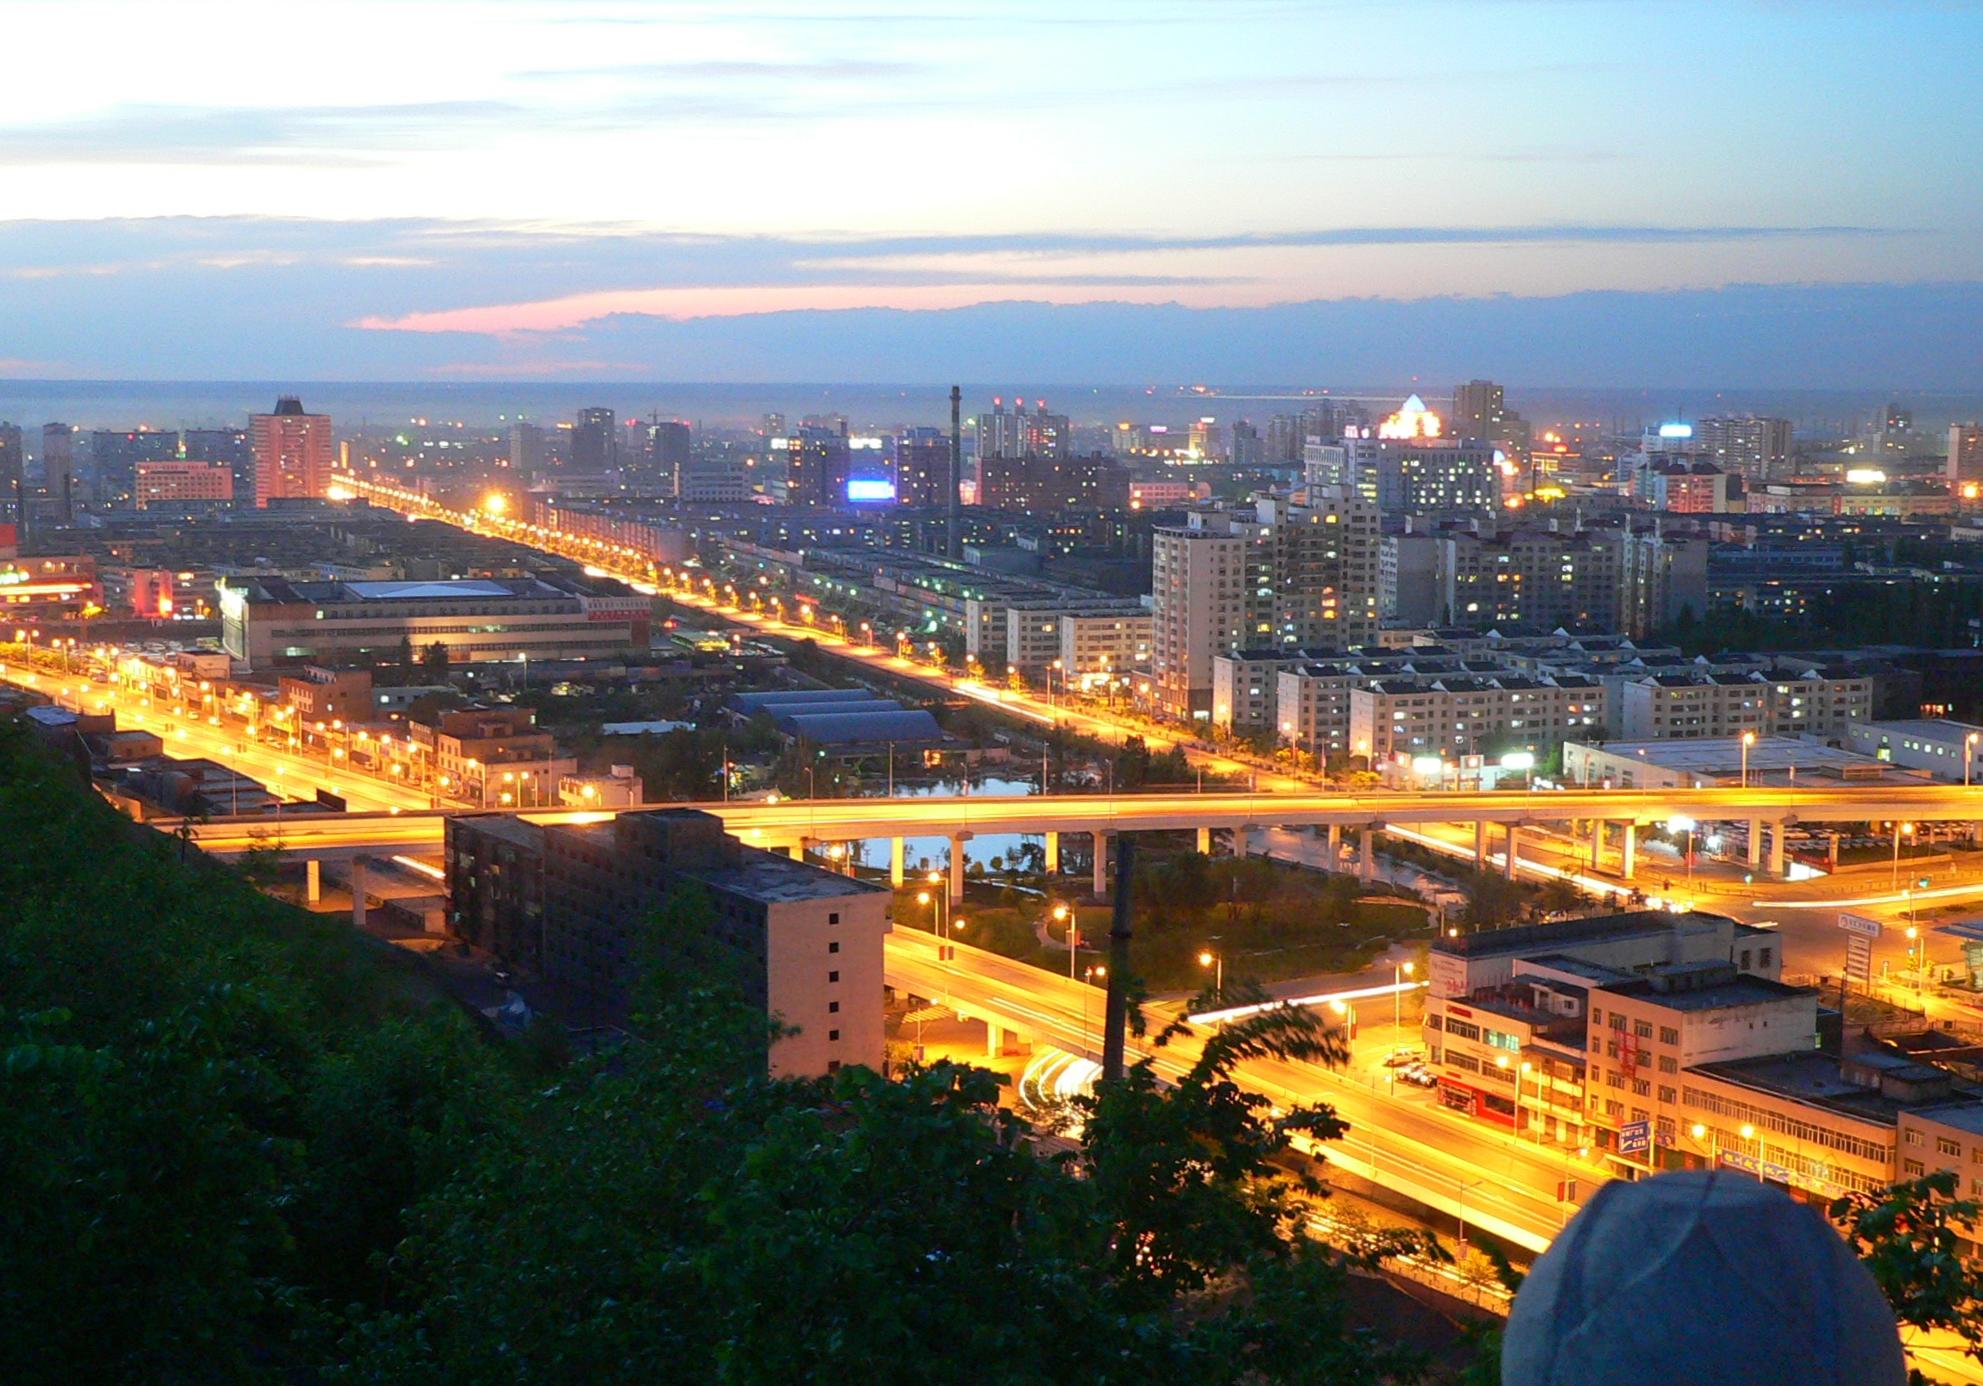 Outer_Ring_Road_of_Urumqi.jpg